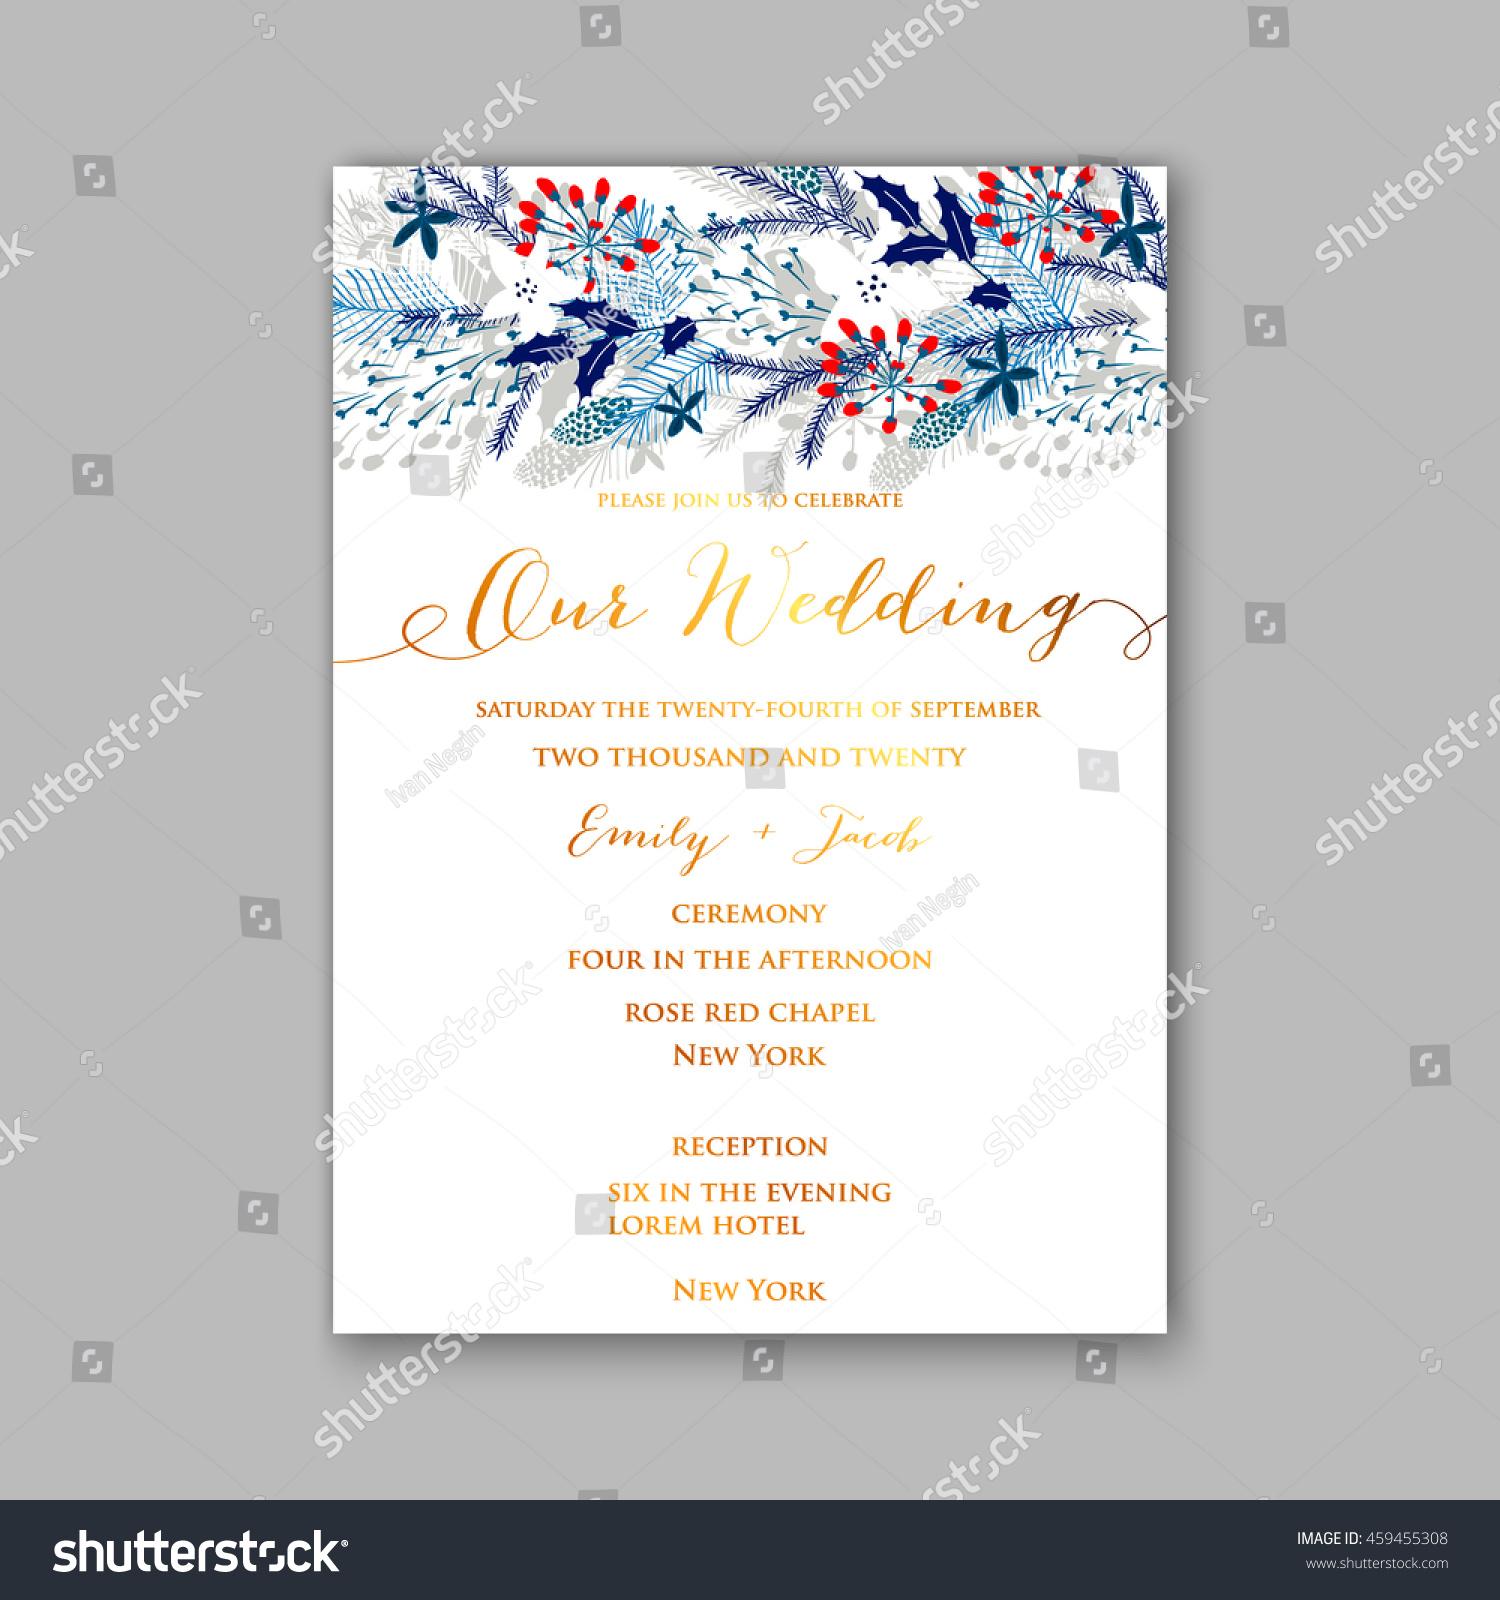 Floral Wedding Invitation Winter Christmas Wreath Stock Vector (2018 ...